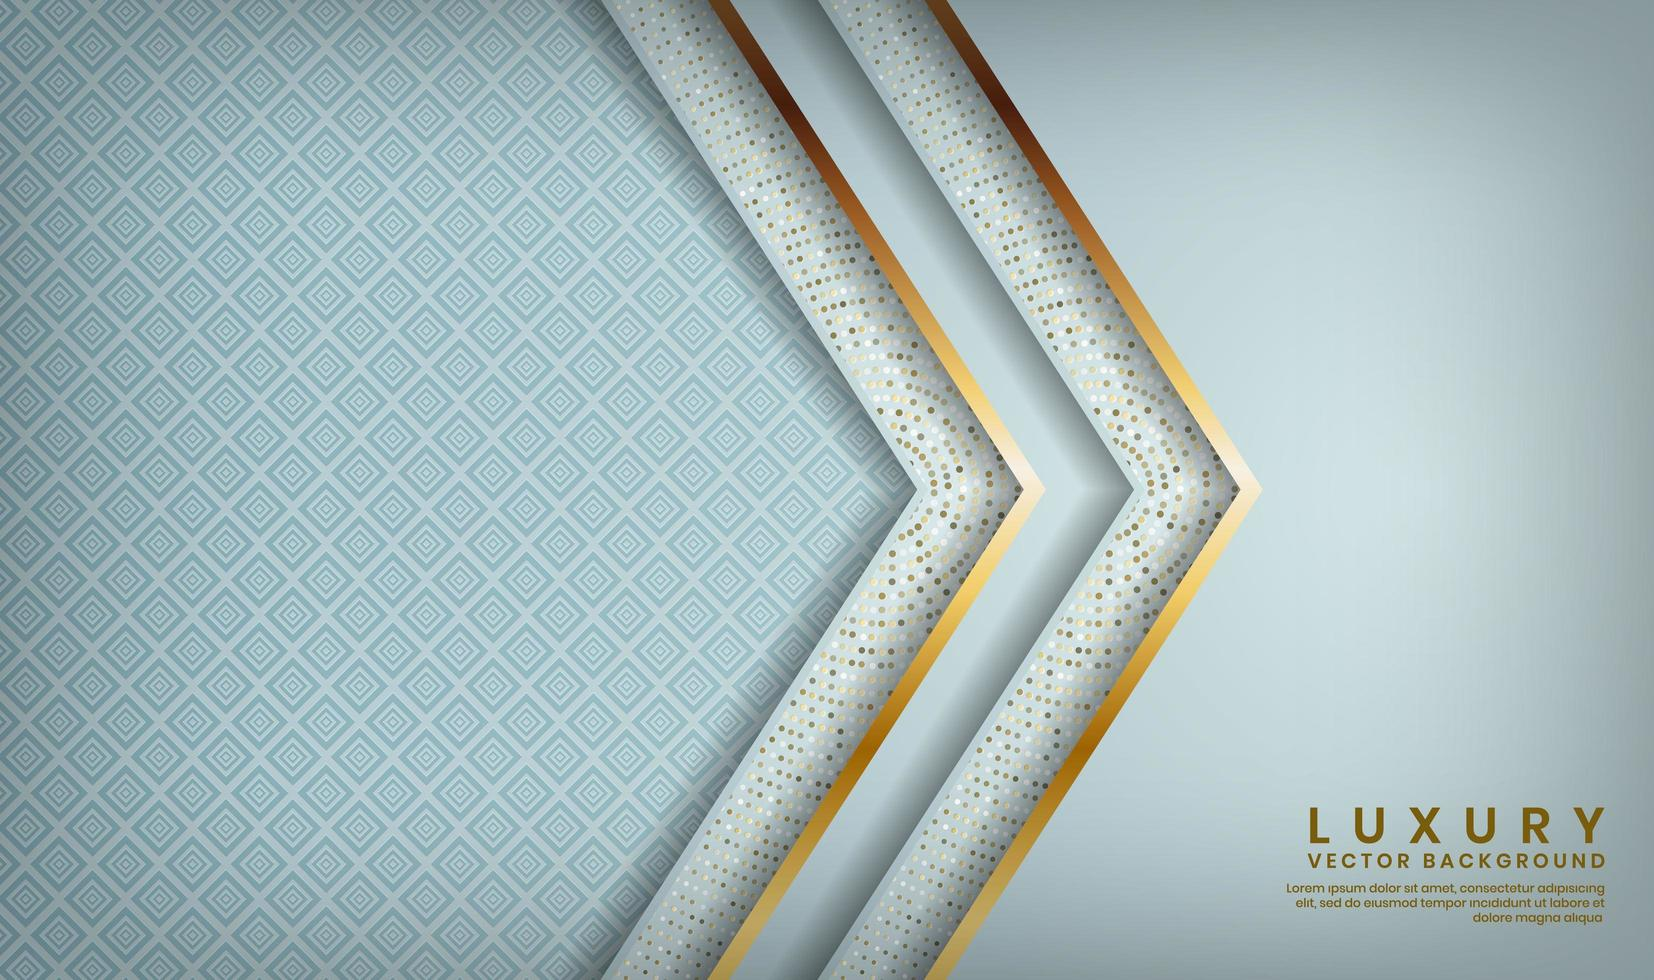 patrón azul con capas forradas de oro en forma de flecha vector